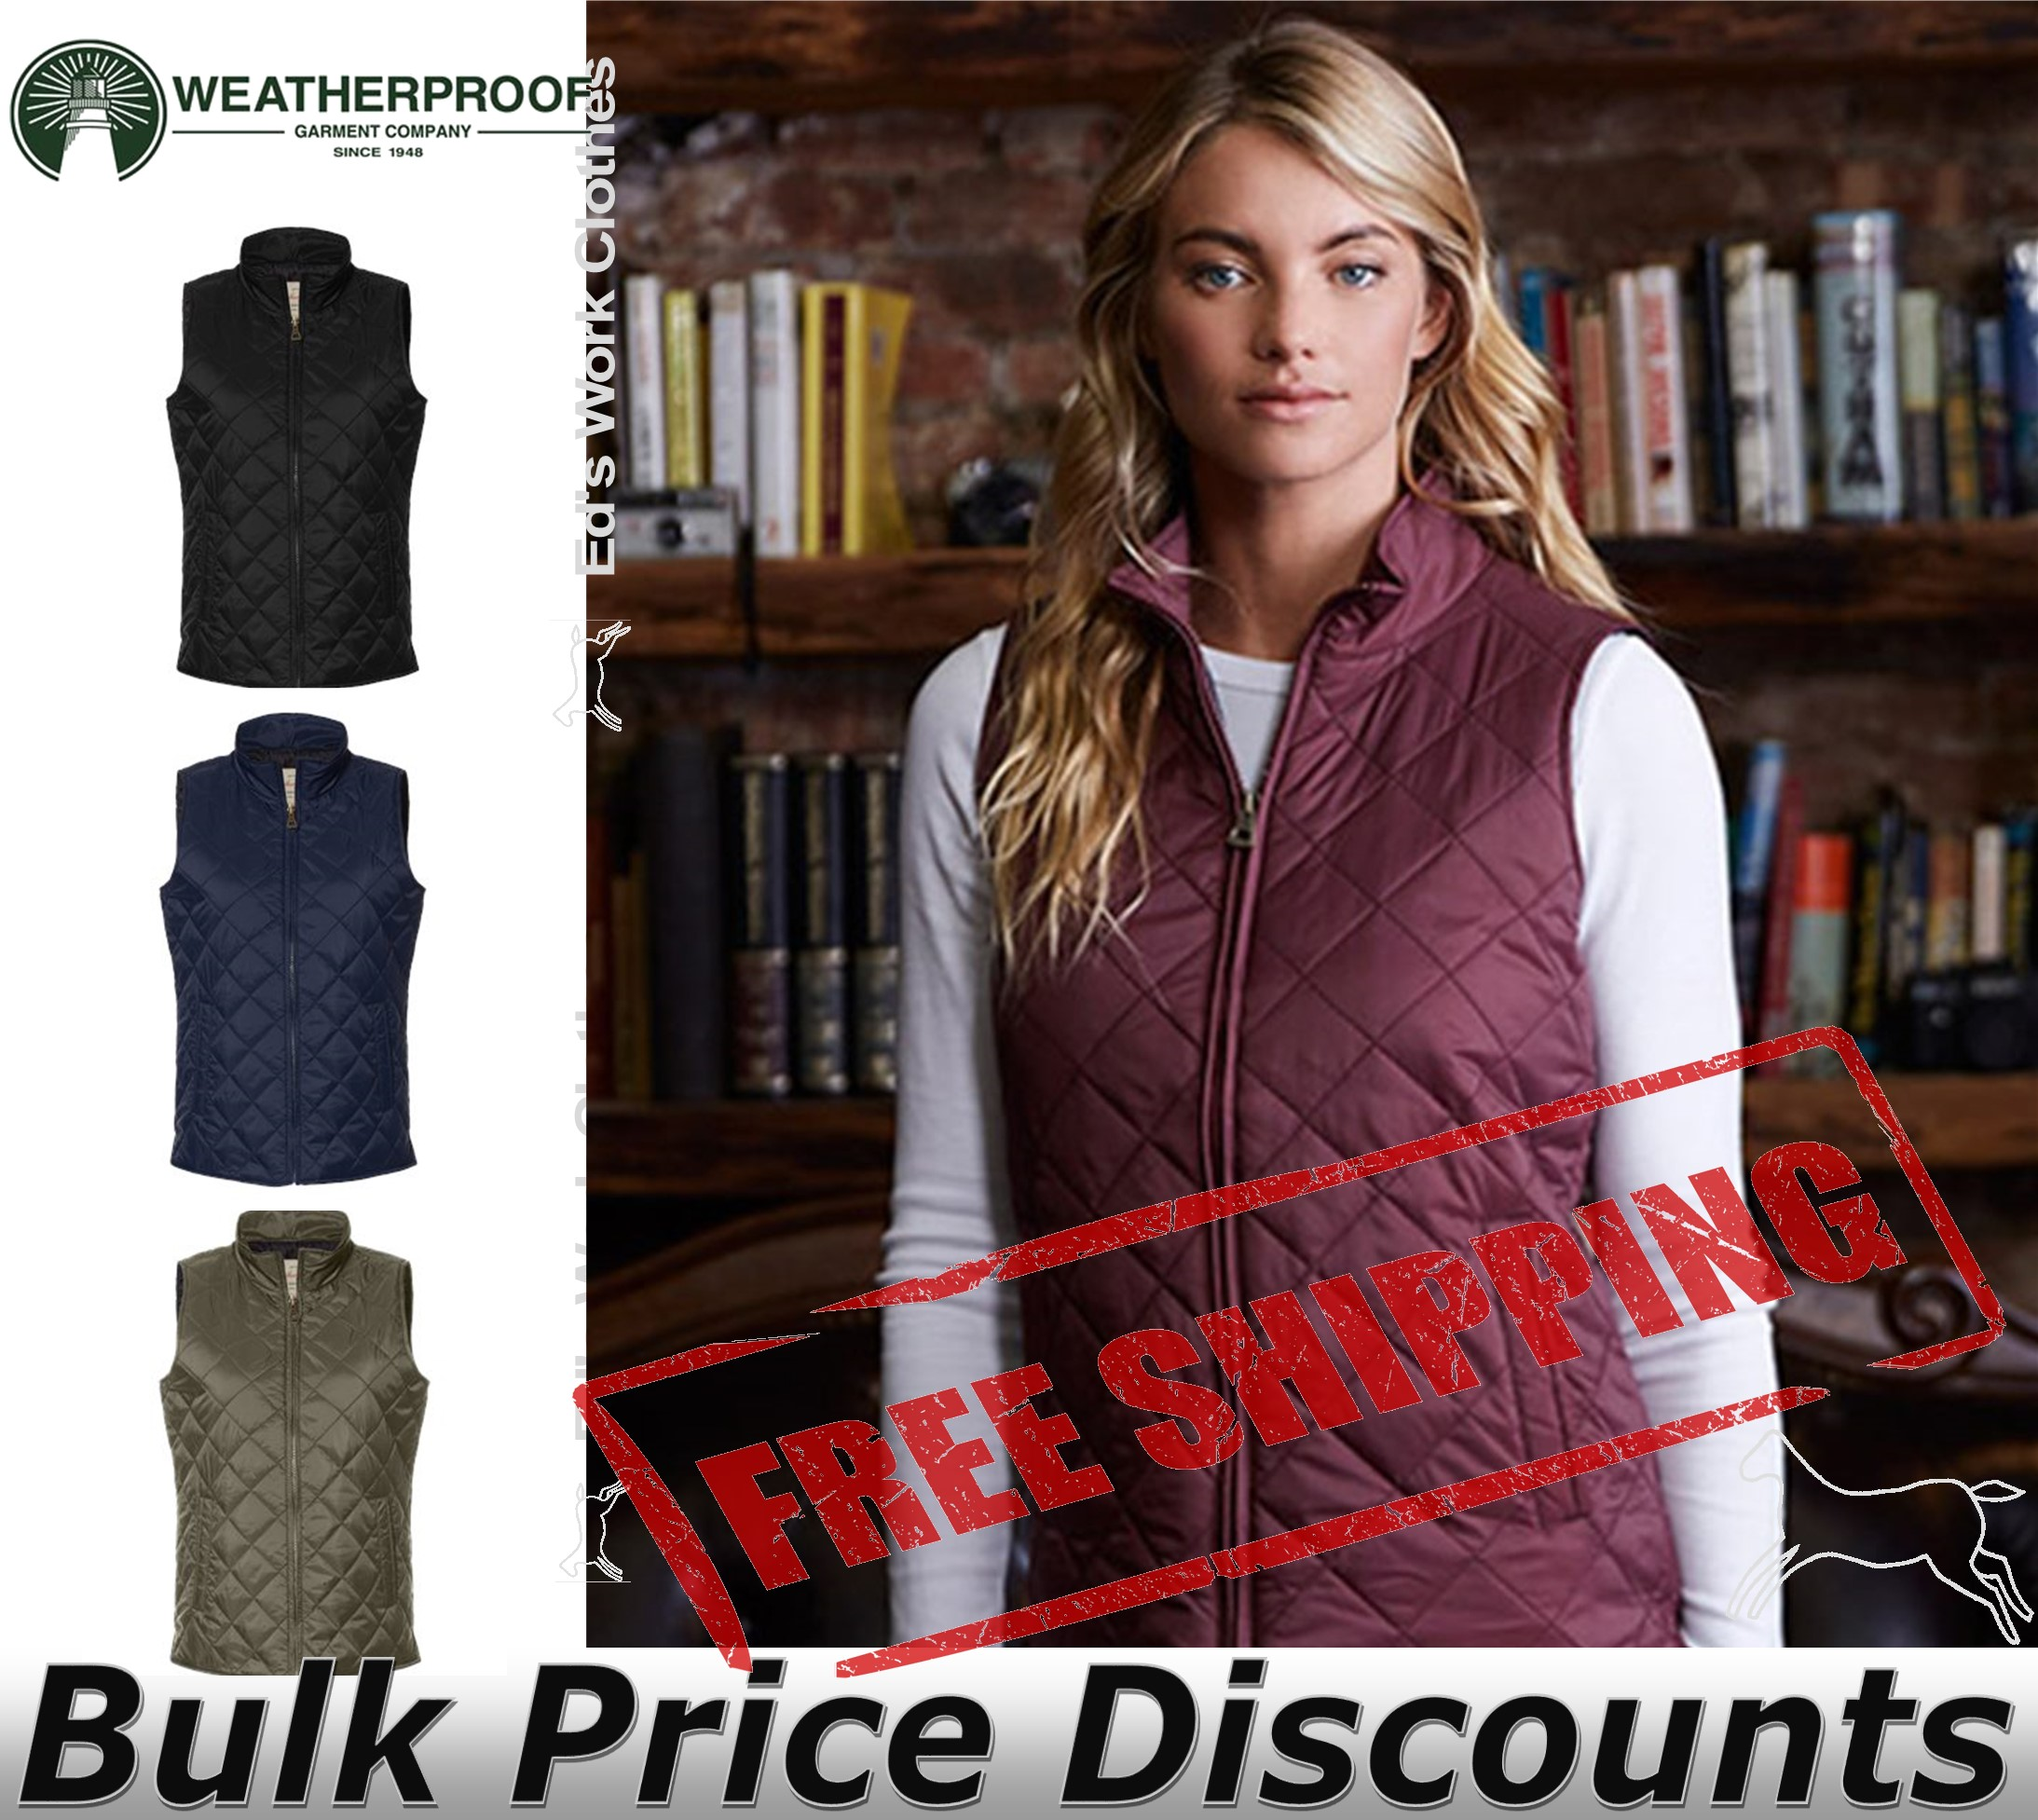 Weatherproof Brand Women's Vintage Diamond Quilted Vest W207359 up to 2XL